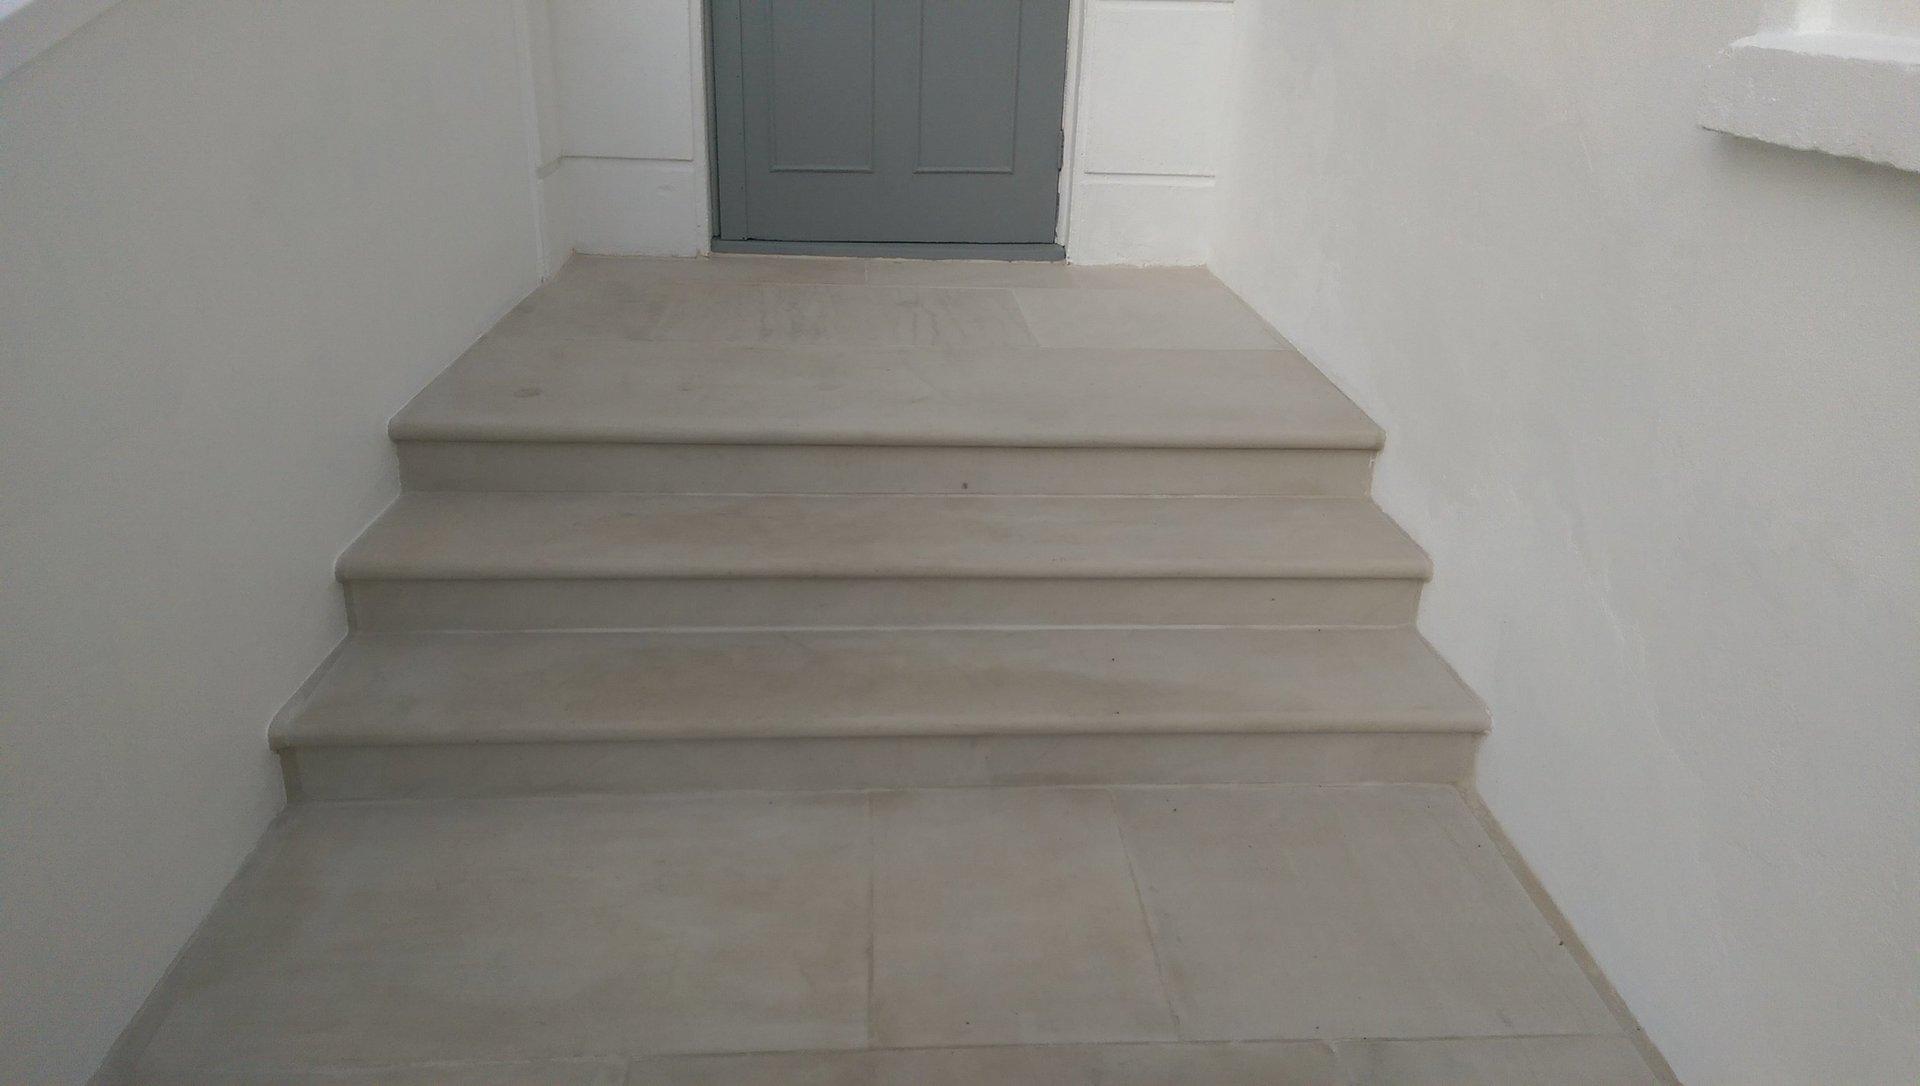 London Garden Builders design Beige Sawn Sandstone paving and steps. Front in Balham